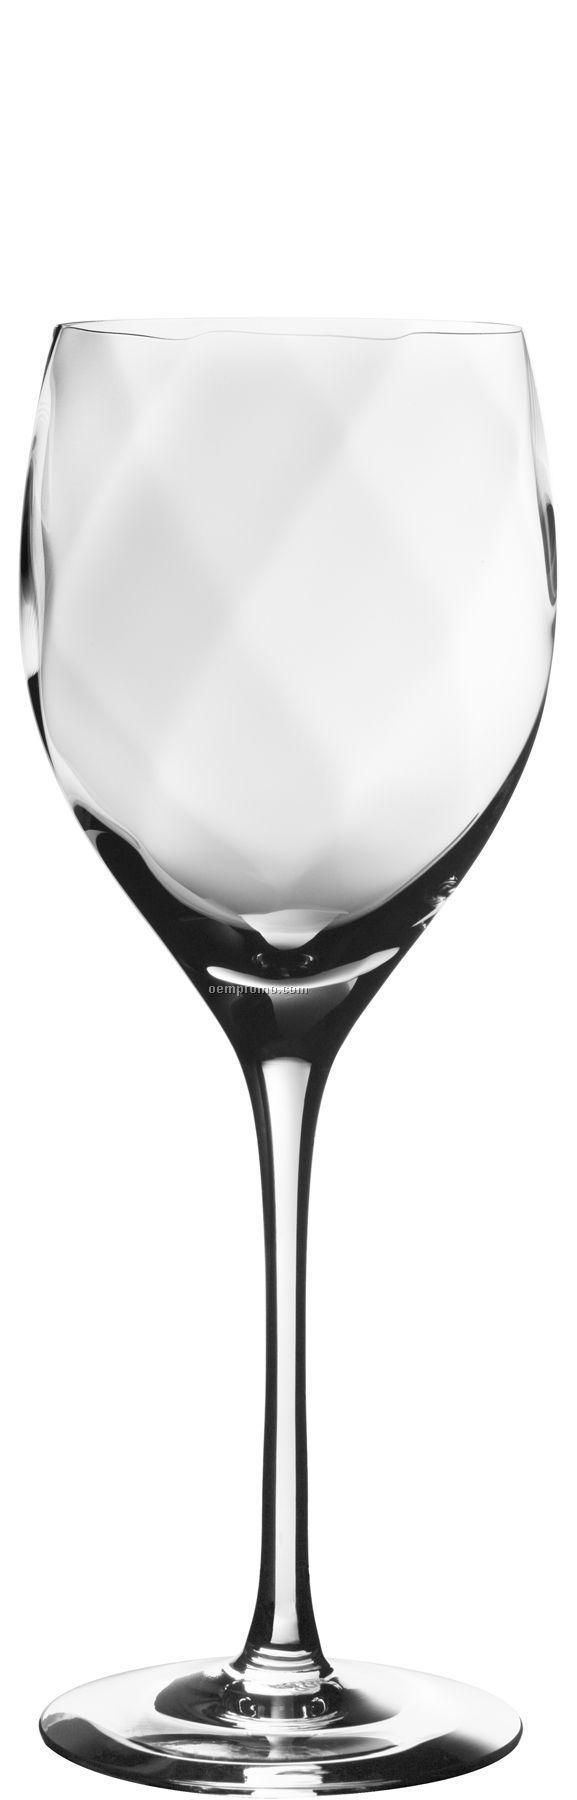 "Chateau Crystal Wine Xl Stemware By Bertil Vallien (8 1/2"")"